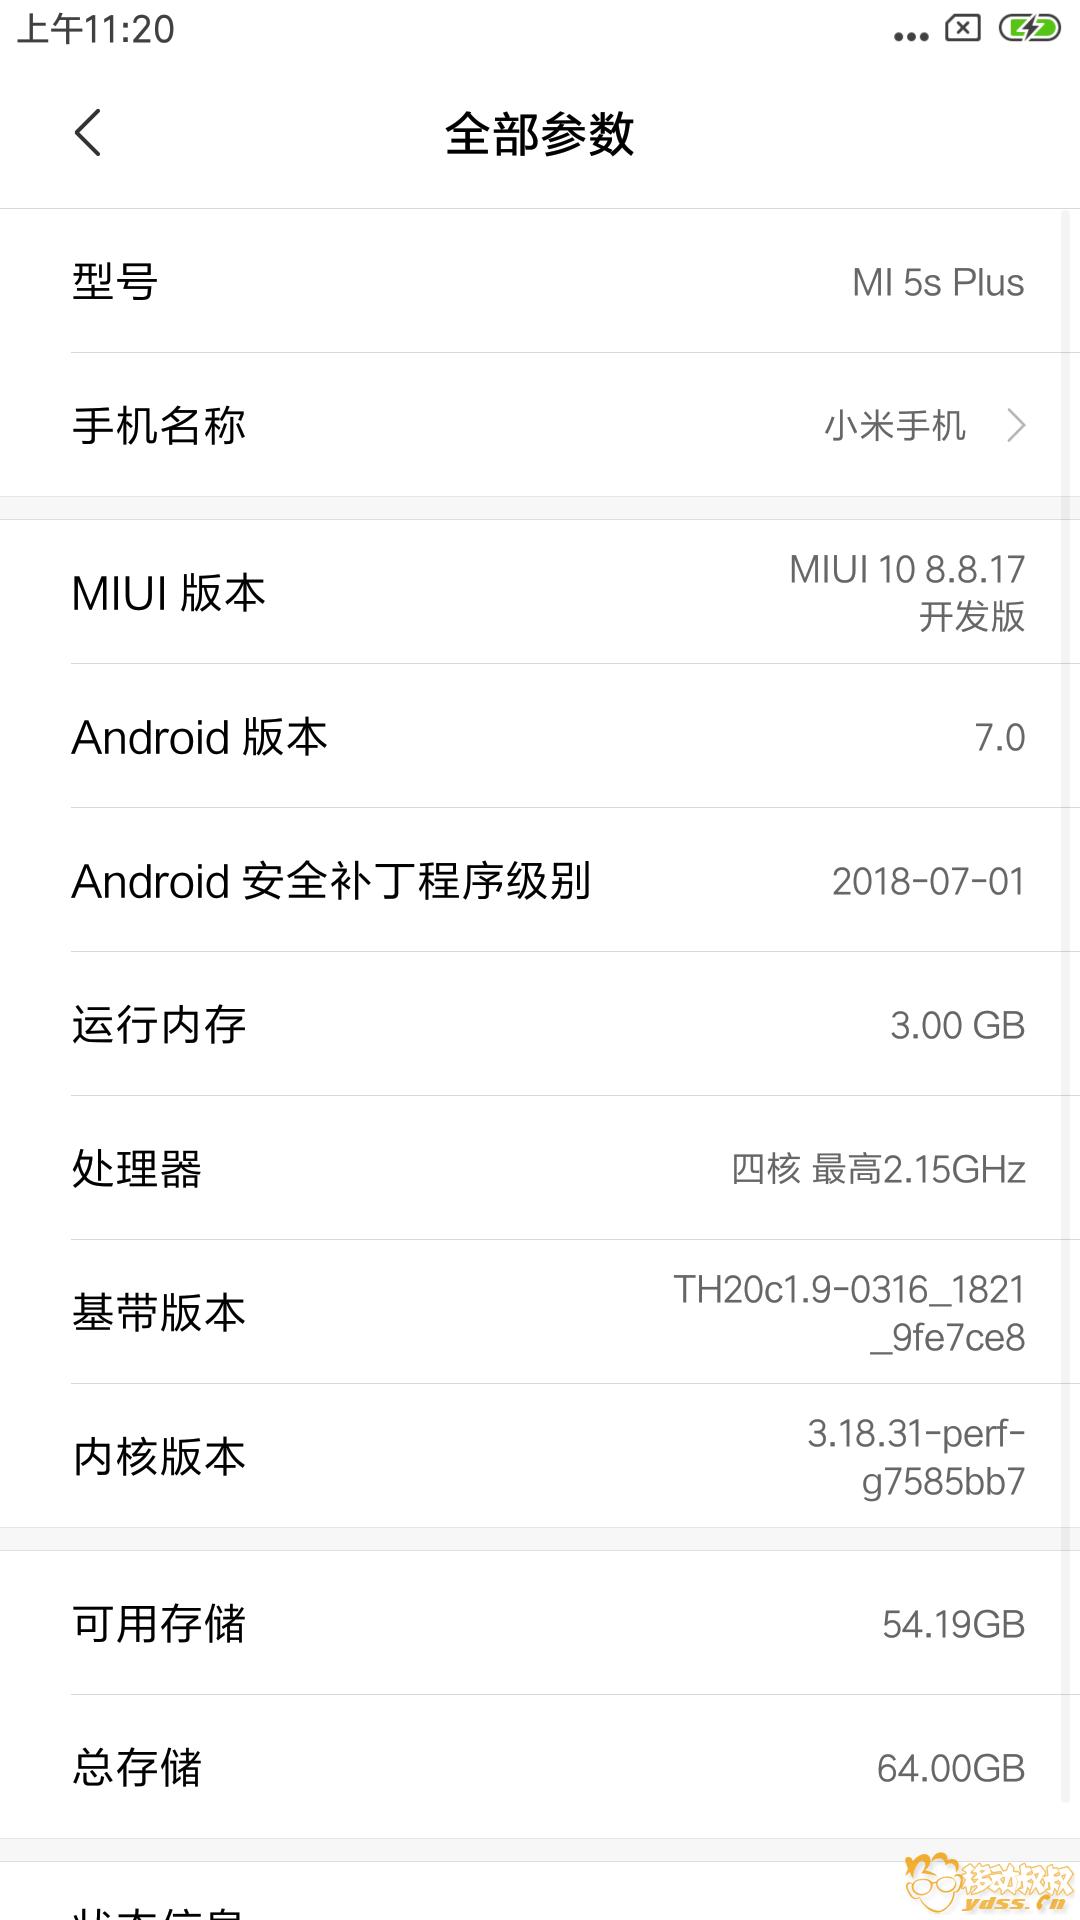 Screenshot_2018-08-17-11-20-28-095_com.android.settings.png